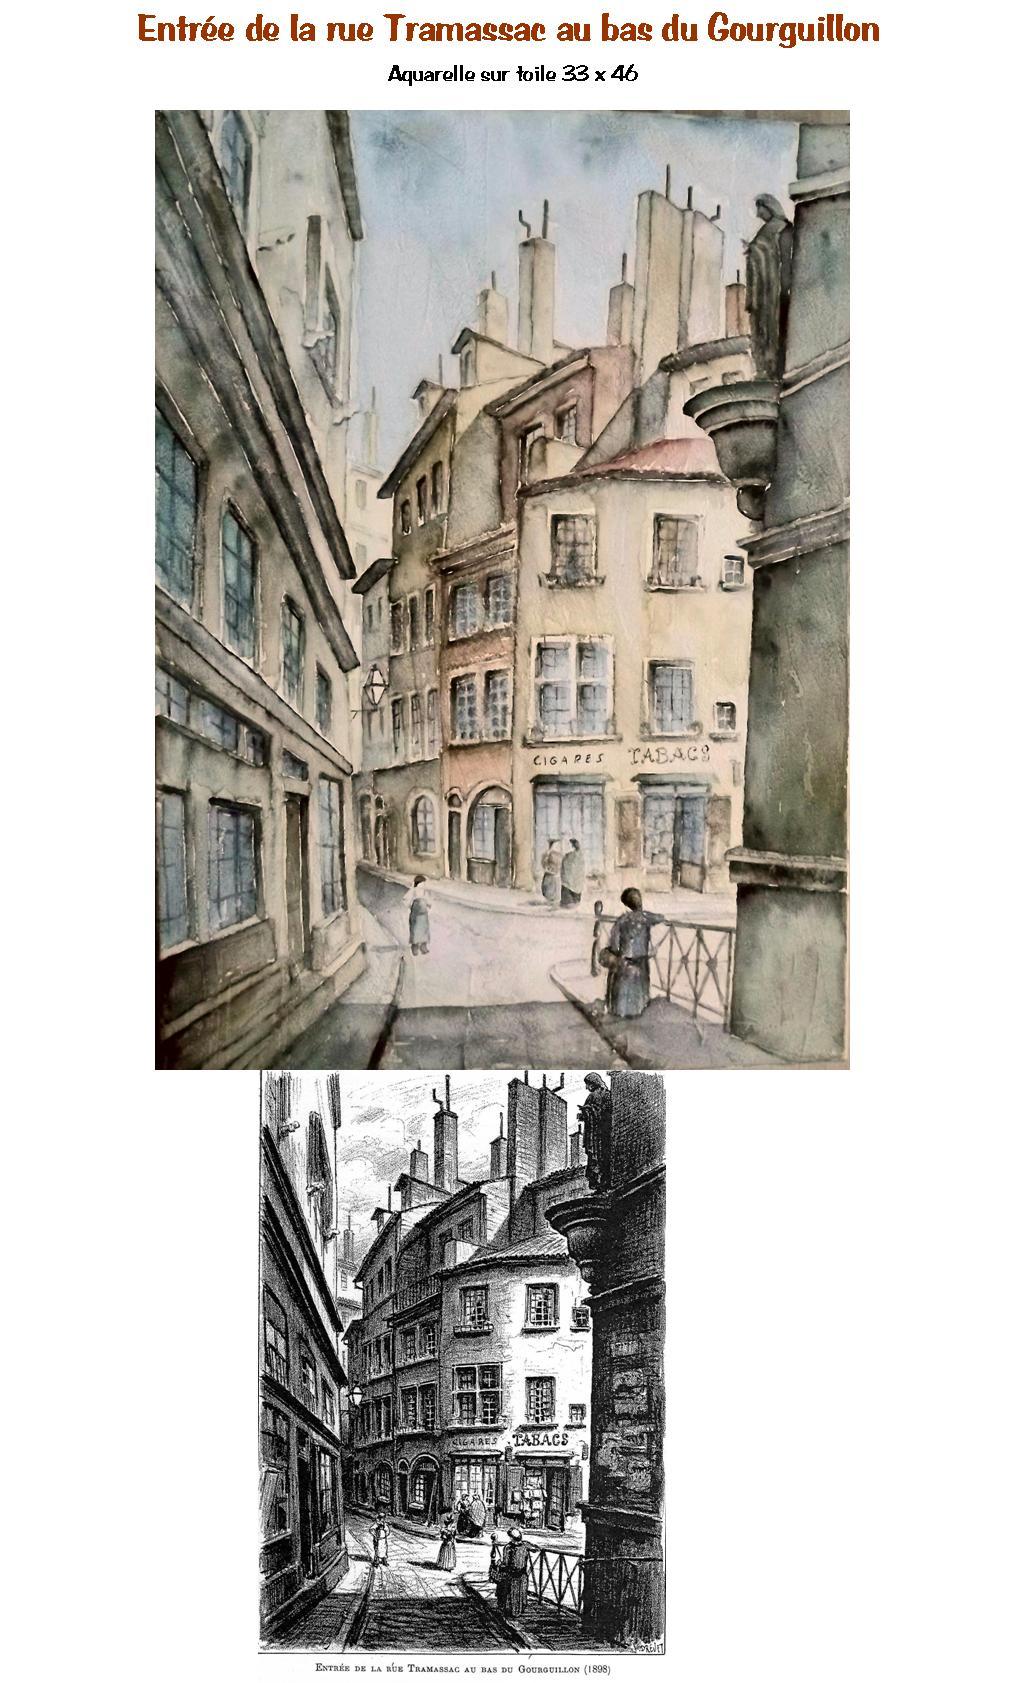 Rue Tramassac au bas du Gourguillon